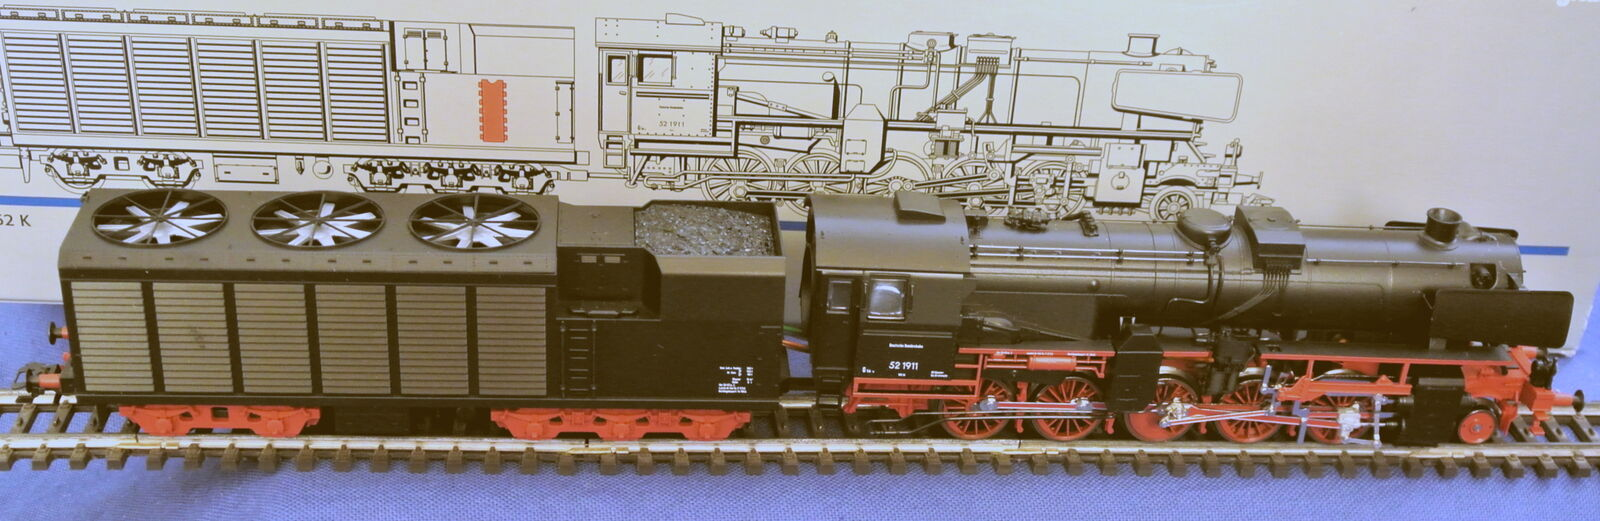 37171 Insider h0 Digital scie locomotiva br52_19 11 mattoncini in scatola originale